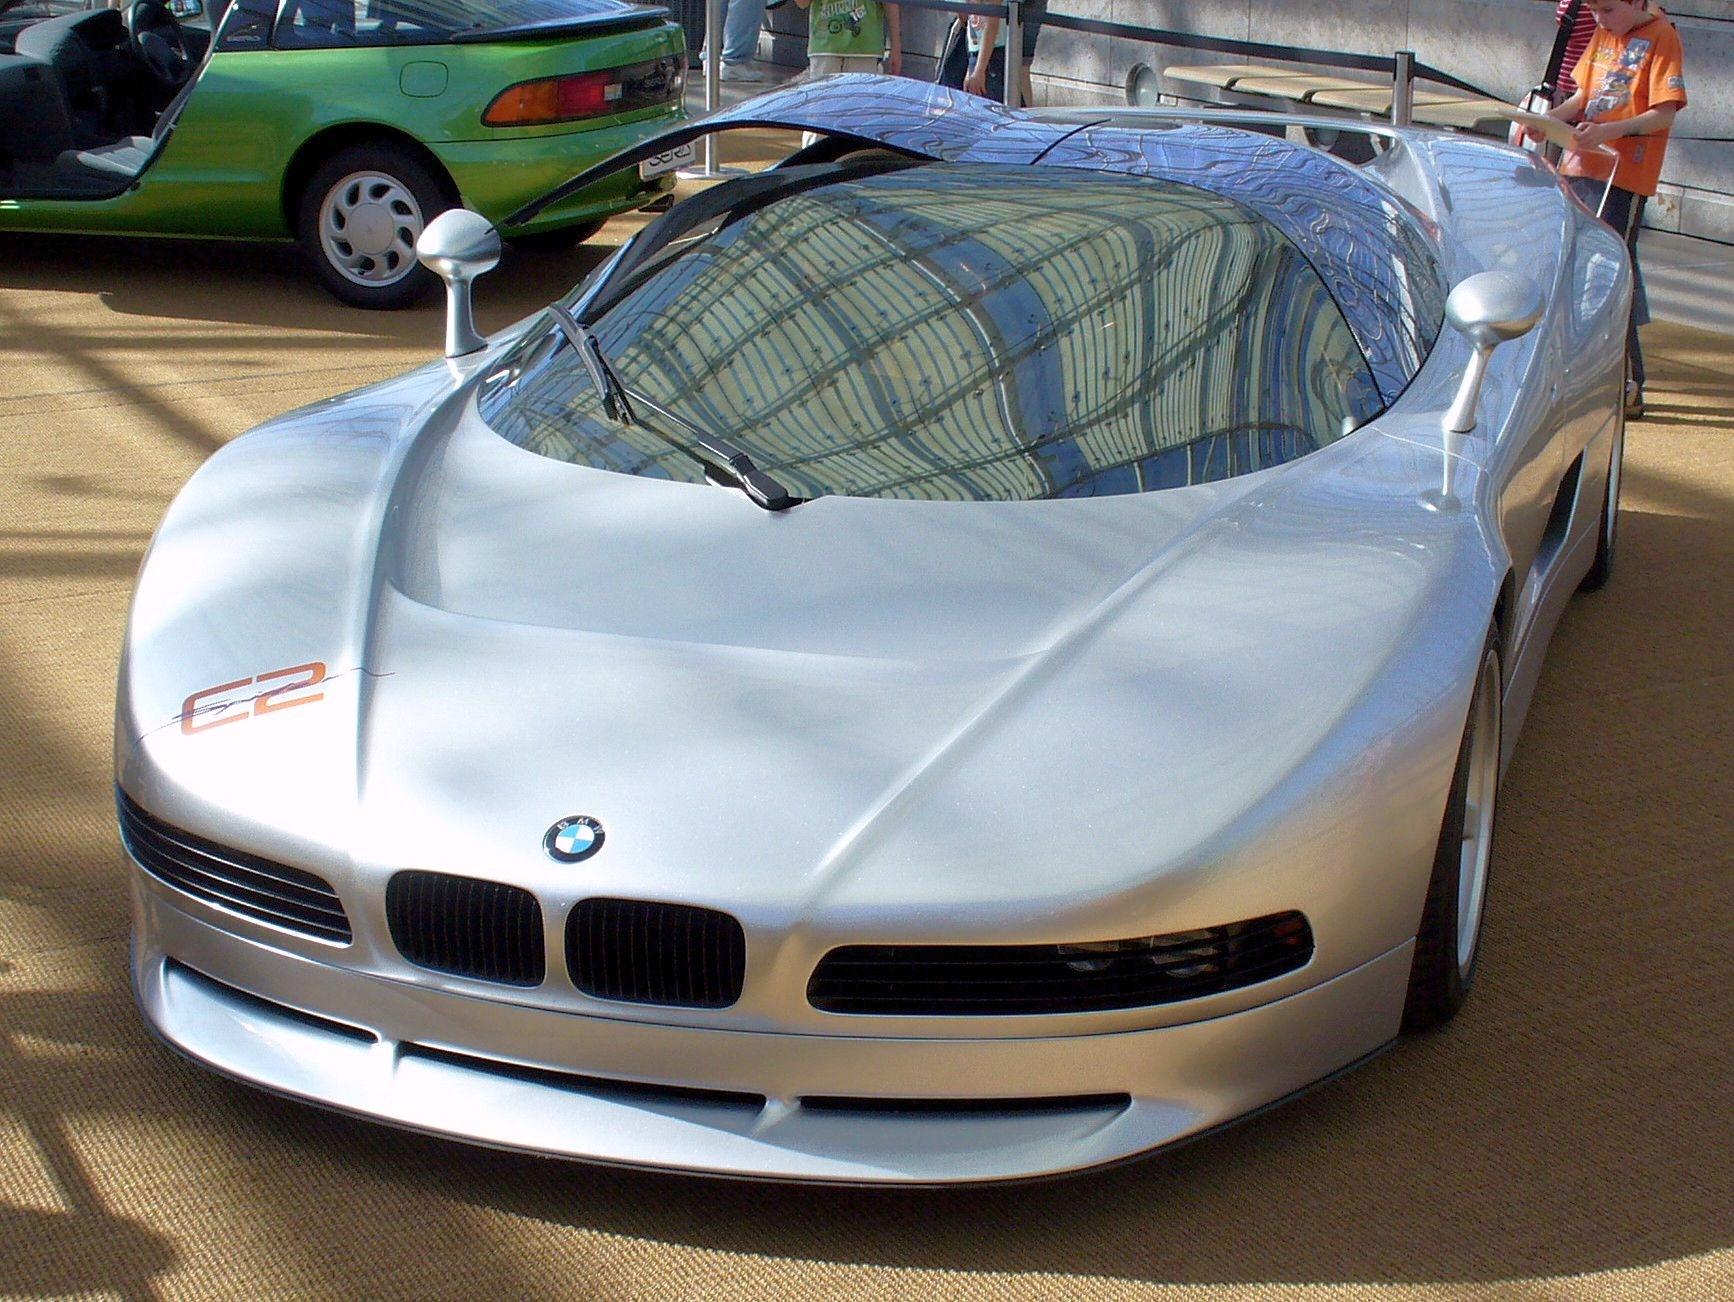 Definitive Wish Car List Forums - Cool german cars